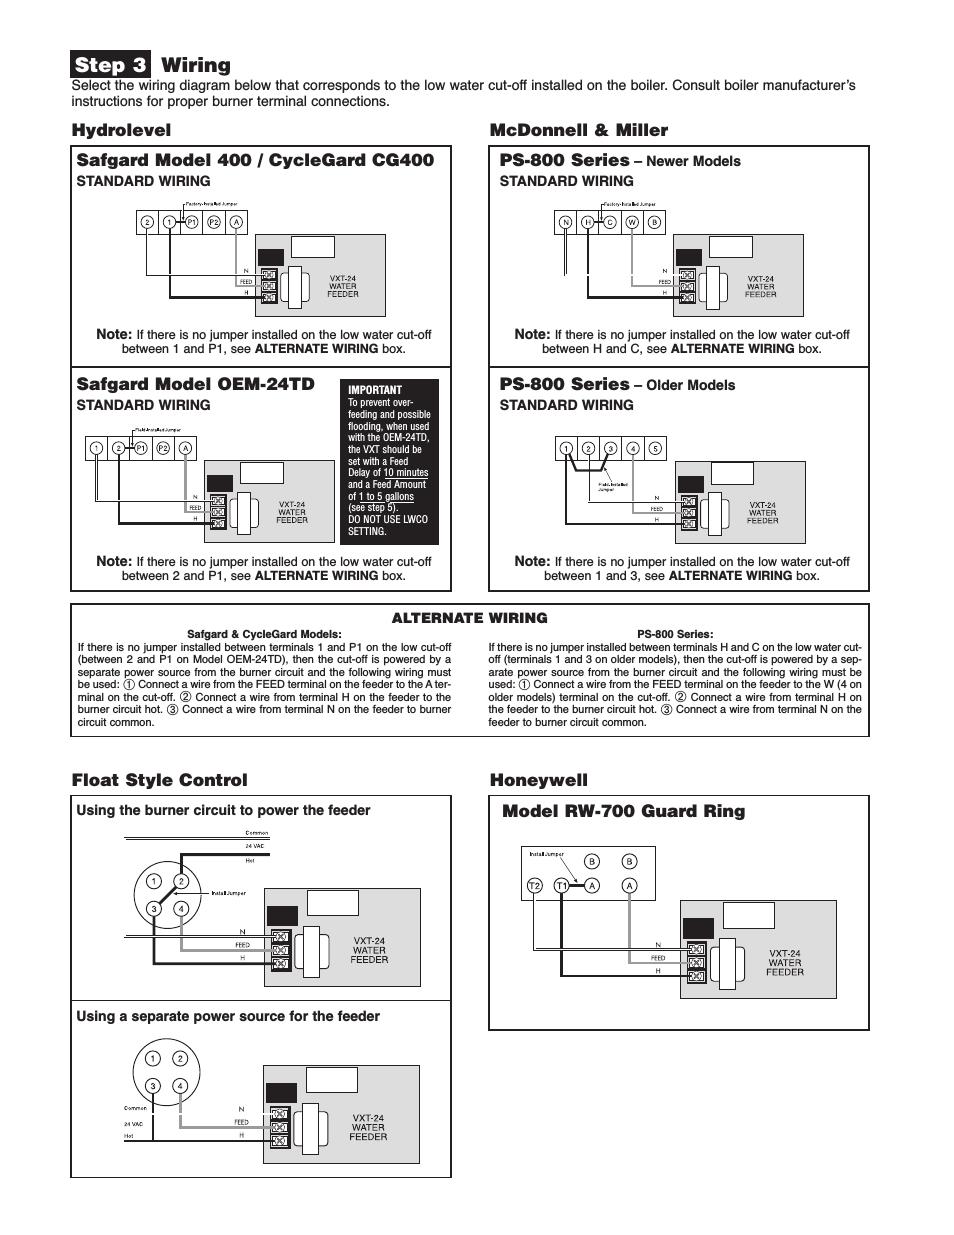 Low Water Cut Off Wiring Diagram | Wiring Diagram - Mcdonnell Miller Low Water Cutoff Wiring Diagram